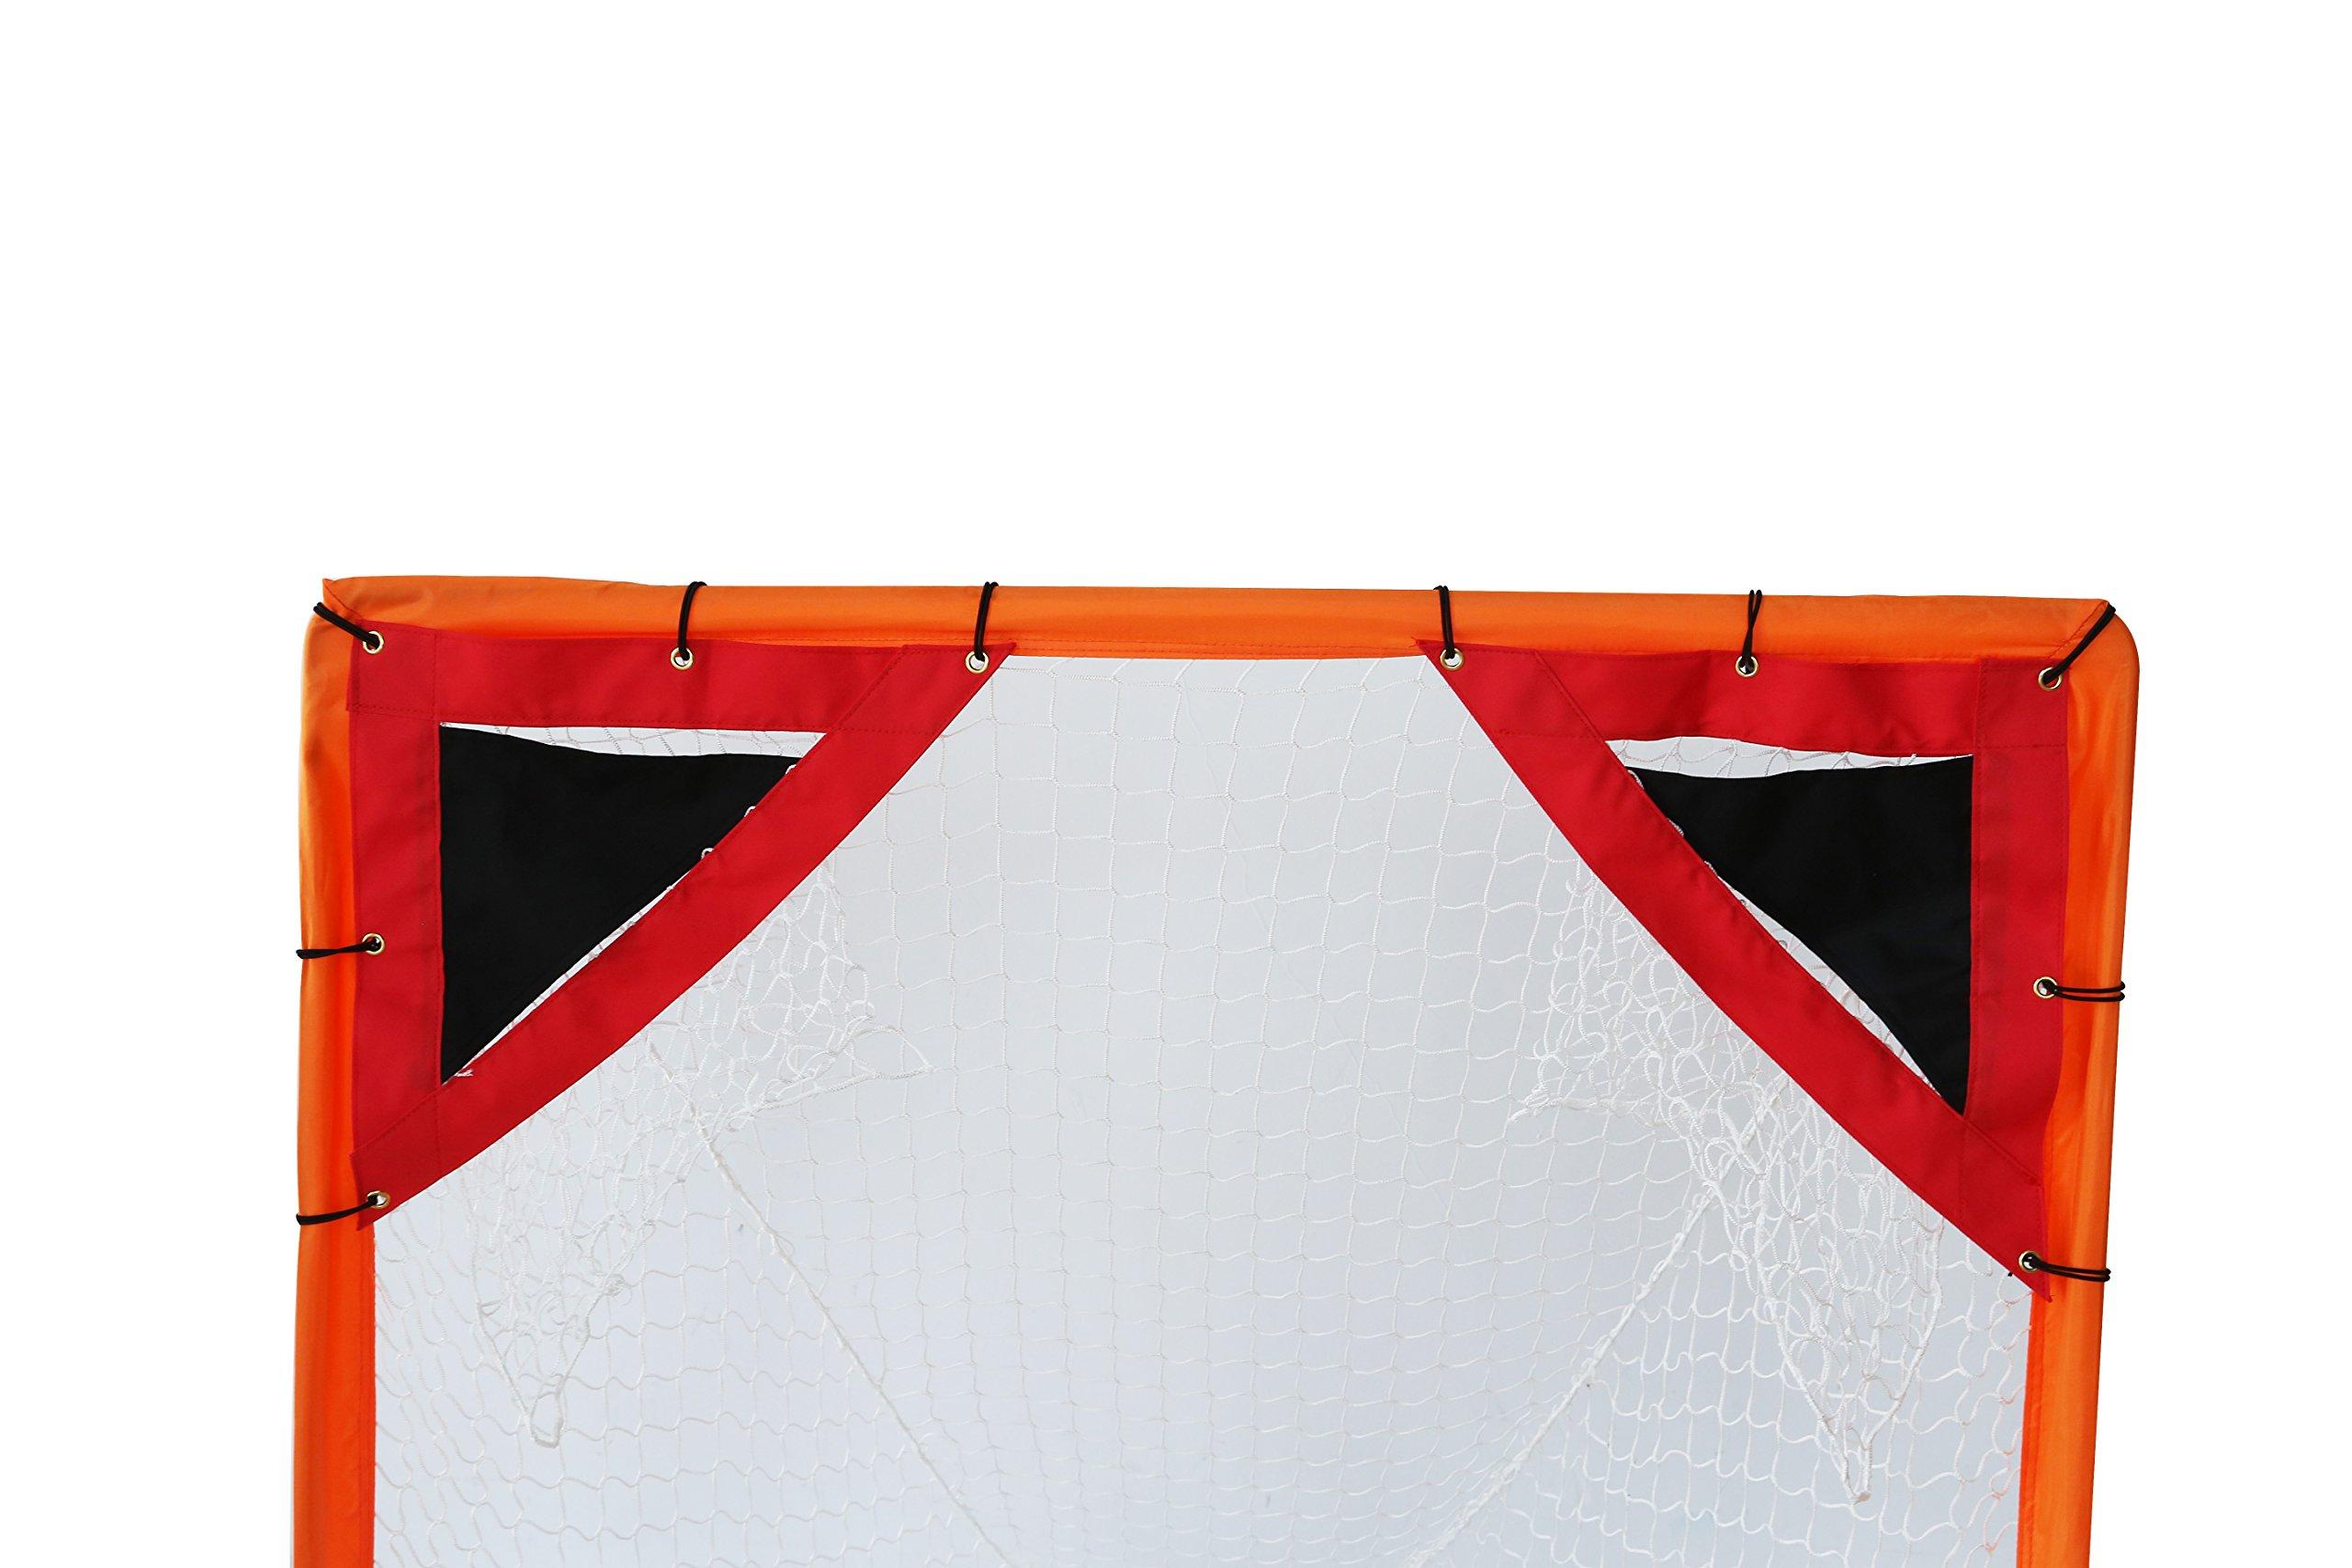 18'' Lacrosse Net Goal Shooting Corner Targets - Set of 2 by Trademark Innovations